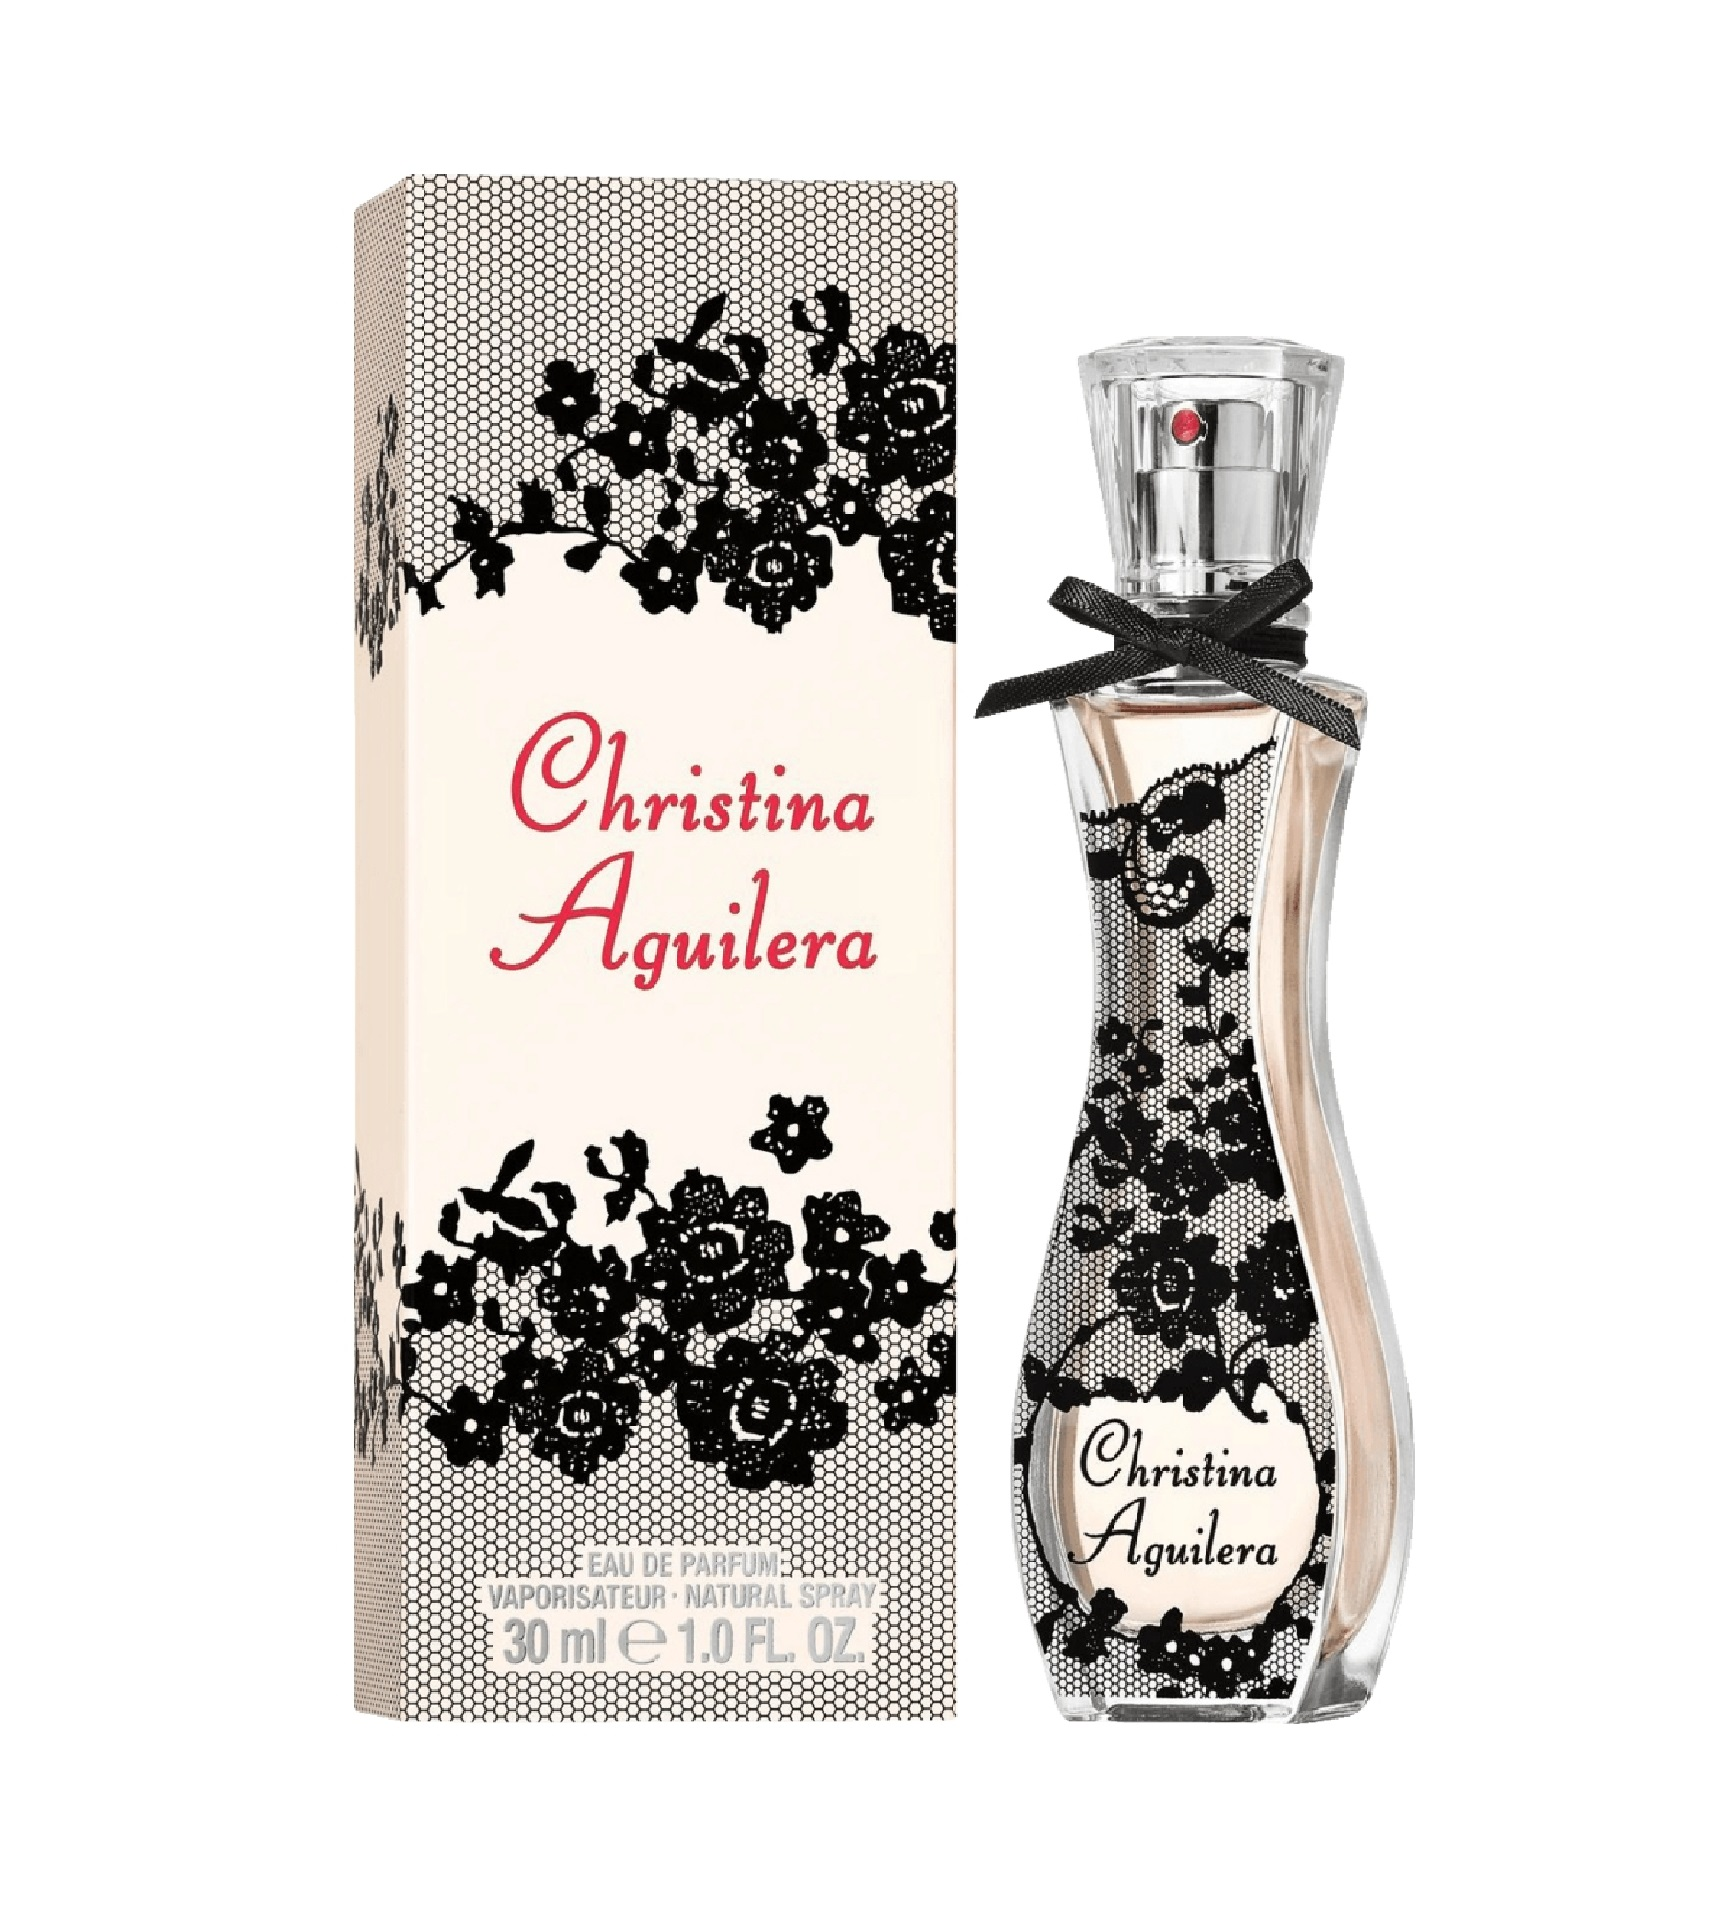 7fddc1edc38 Christina Aguilera Eau de Parfum, 30 ml – Perla |#1 Au Maroc & prix ...